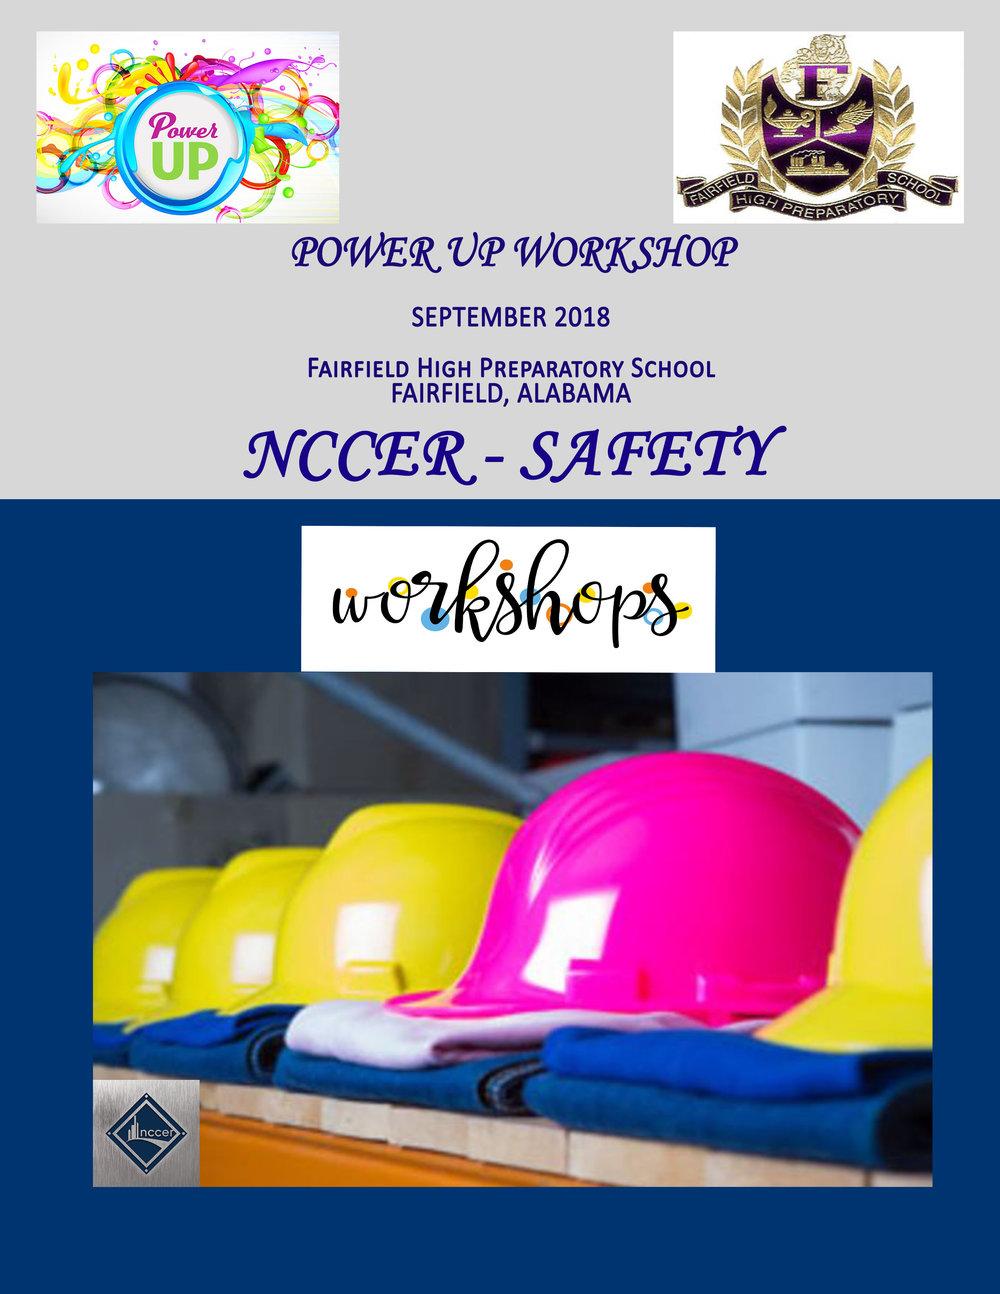 Power UP Workshop NCCER SAFETY Fairfield AL 9.2018 flyer.jpg